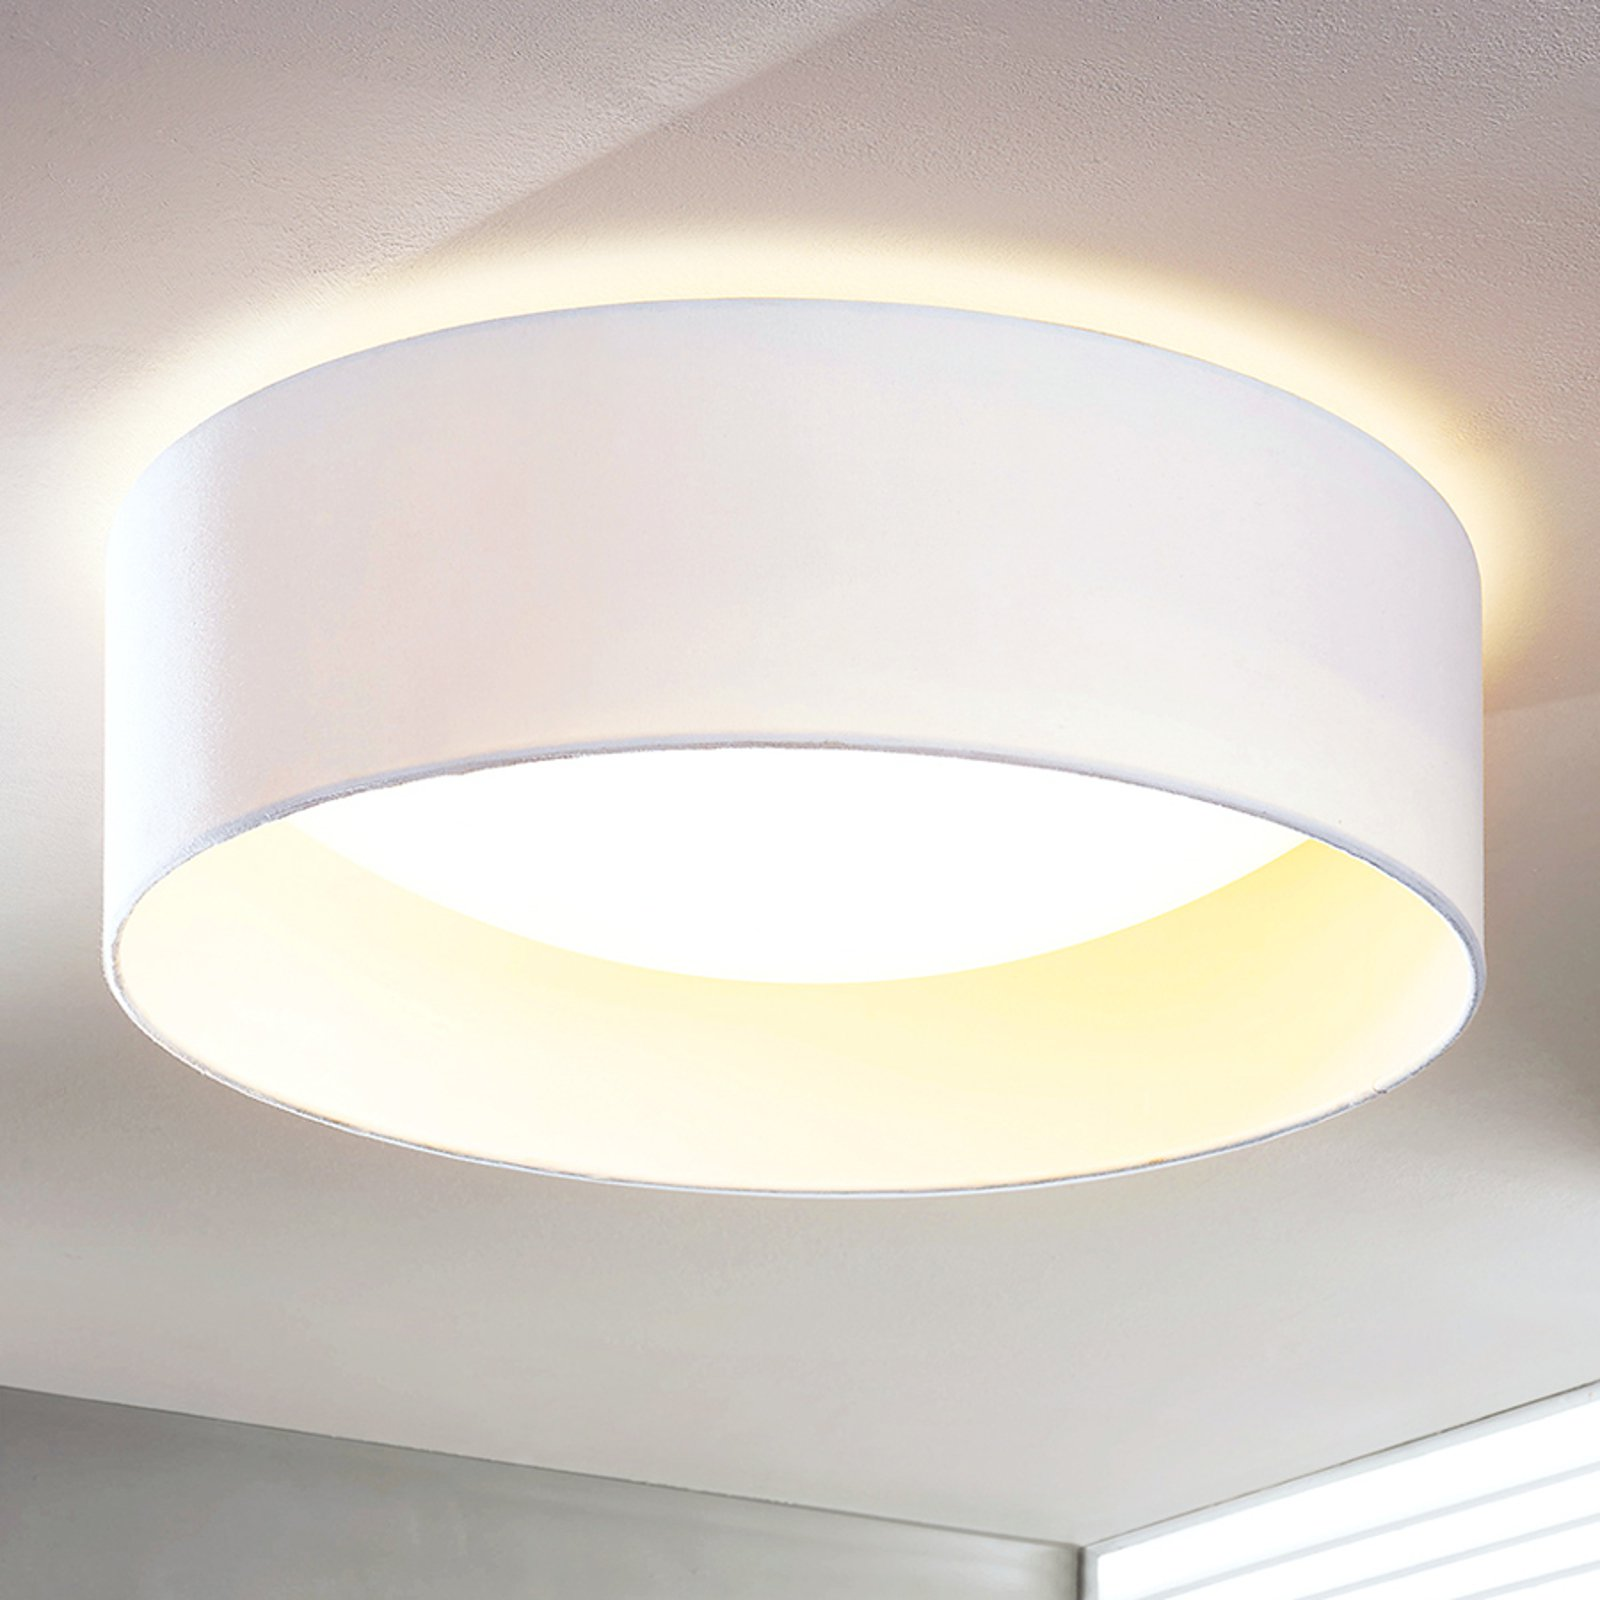 LED-taklampe Franka, hvit, 41,5 cm